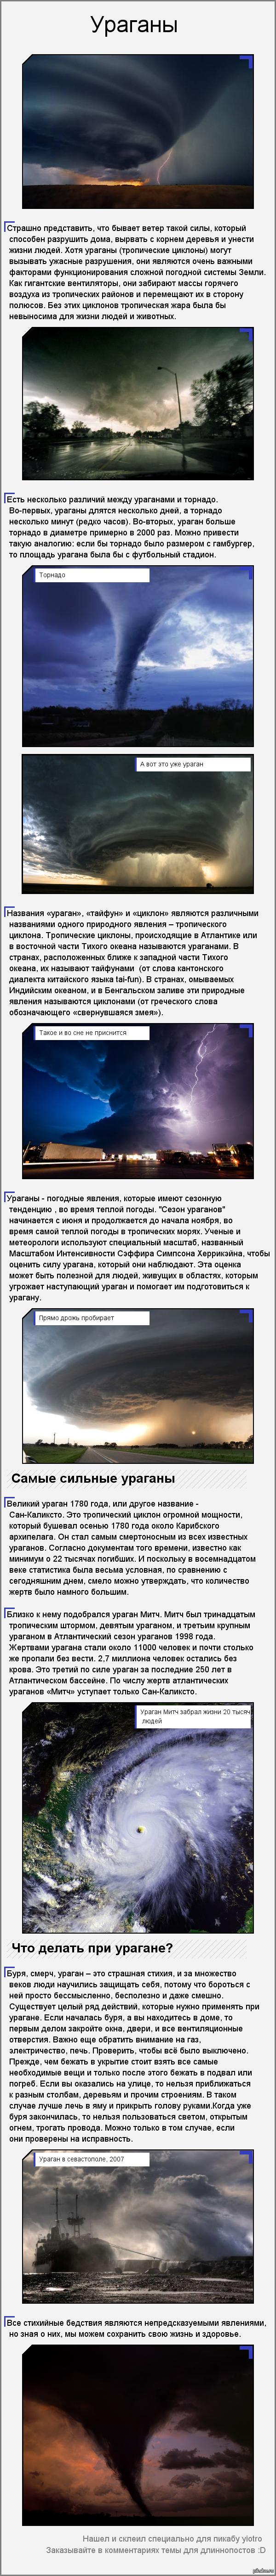 "Про ураганы (длиннопост) По просьбе <a href=""http://pikabu.ru/story/kak_vyizhit_pri_yadernom_vzryive_dlinnopost_1611636#comment_16938494"">#comment_16938494</a>"